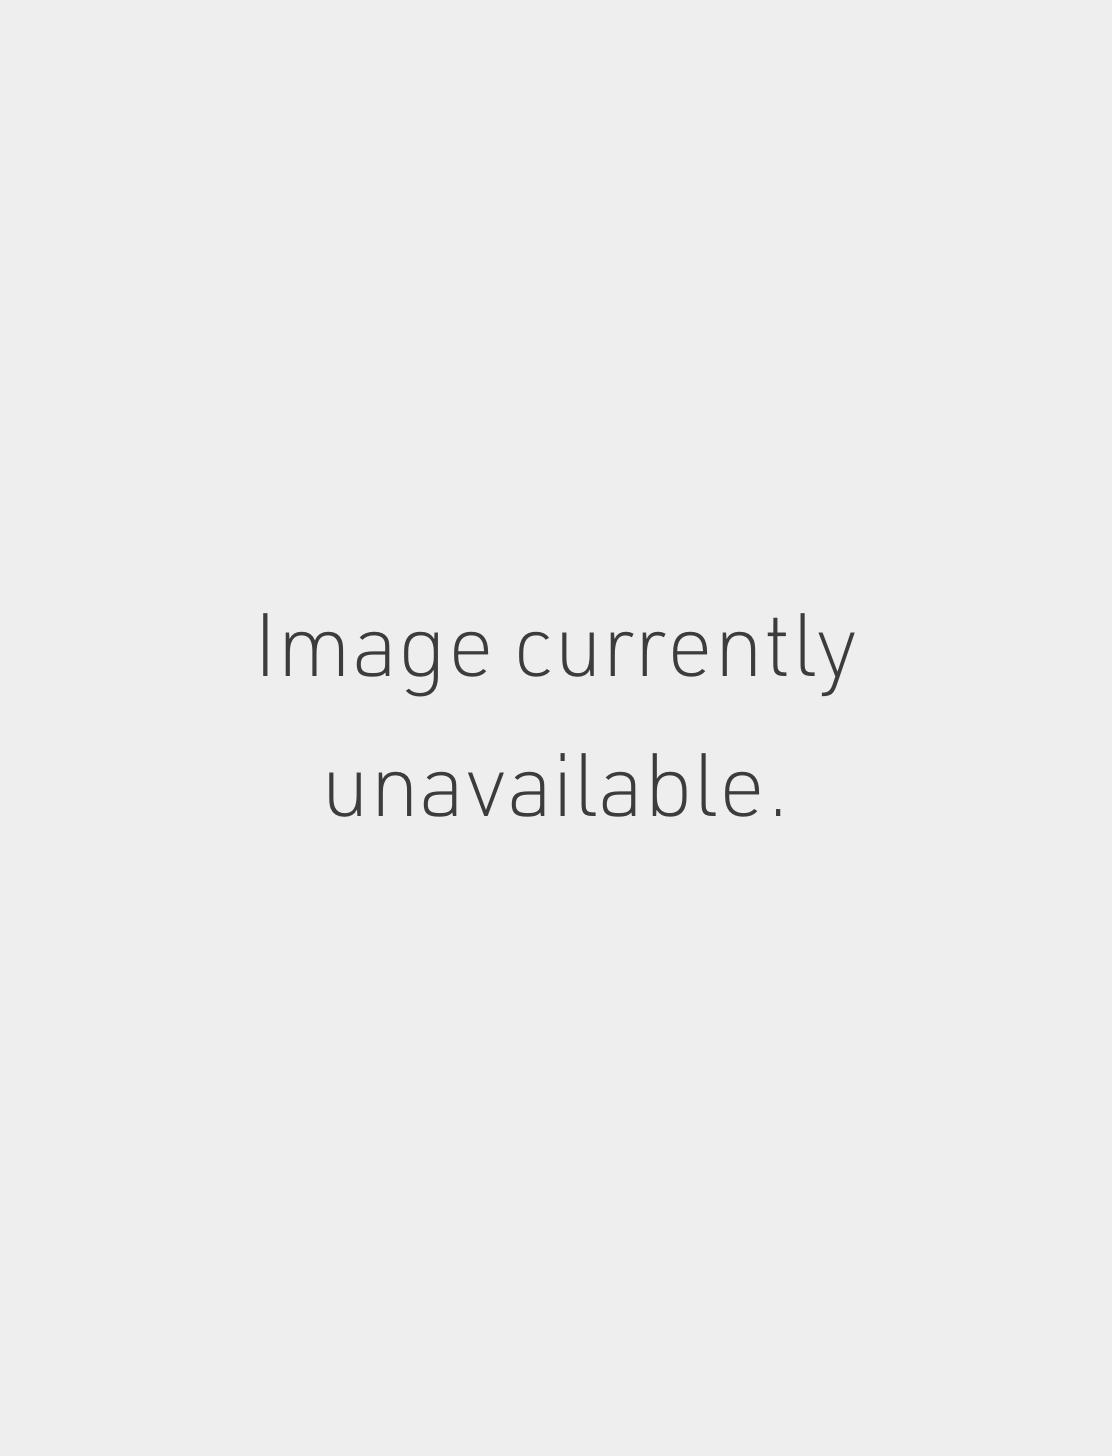 2mm Scalloped Set Diamond Tradtional Ear Post Image #1